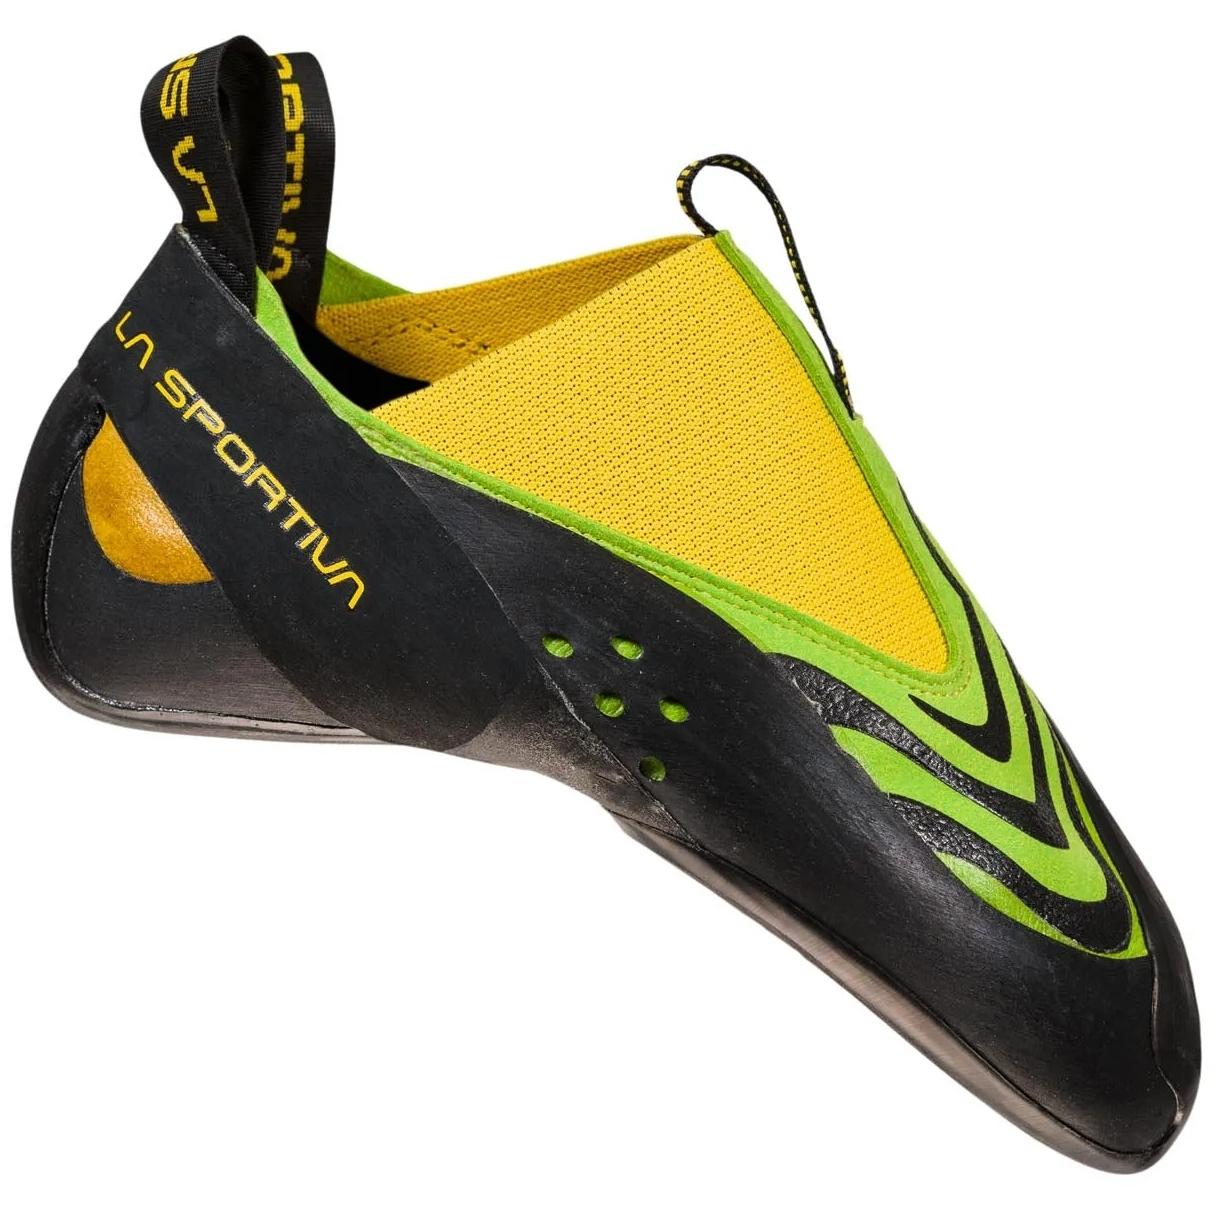 La Sportiva Speedster Climbing Shoes Unisex - Lime/Yellow